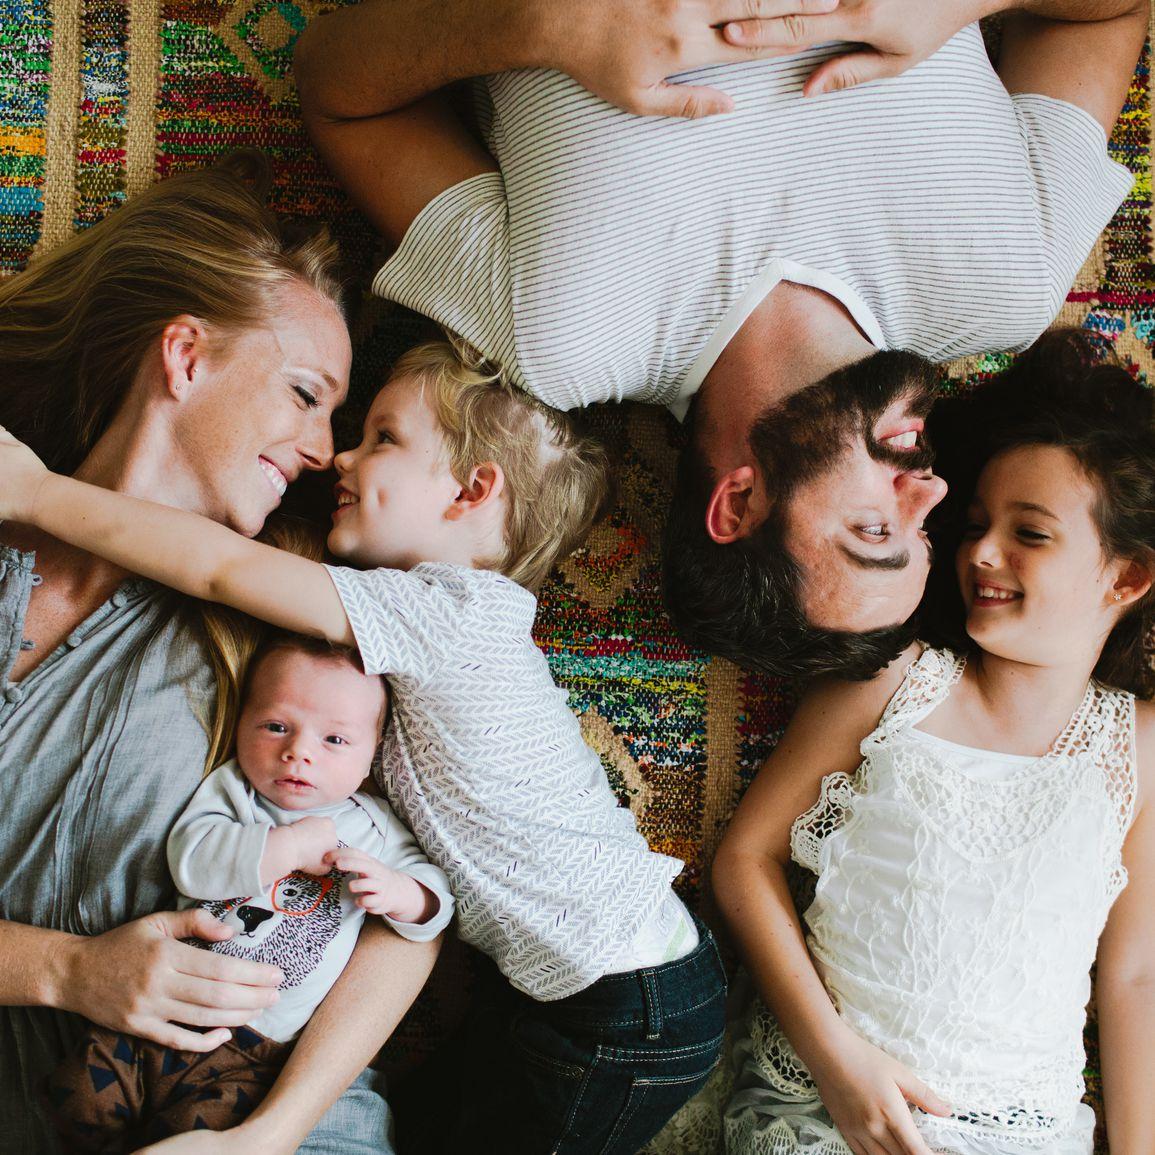 How to Strengthen Family Bonds